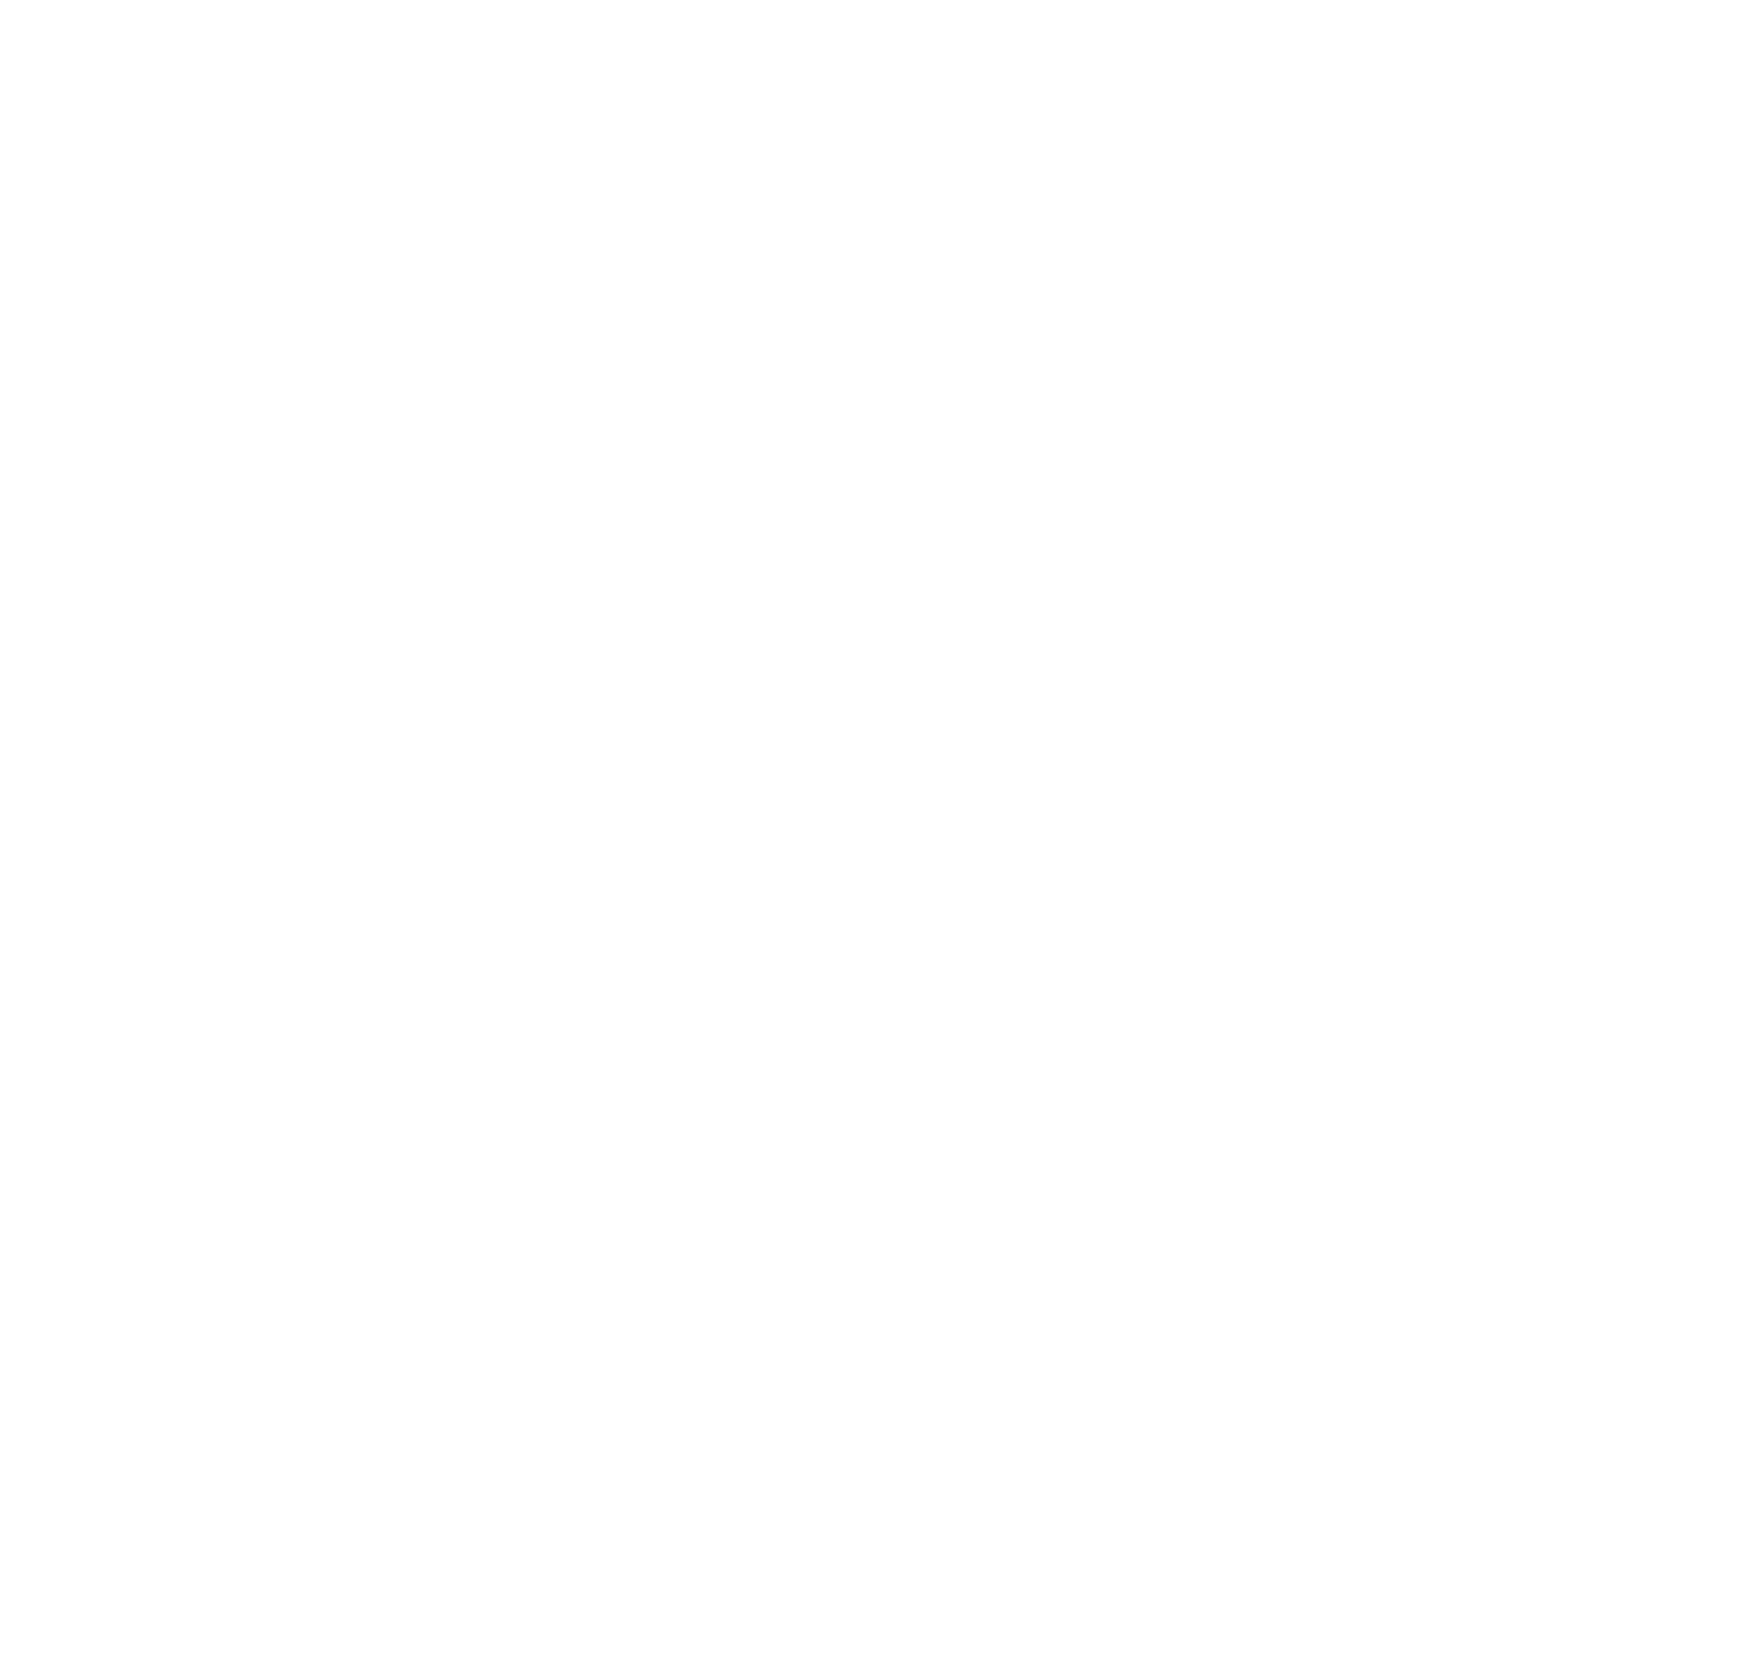 Mandy Otto